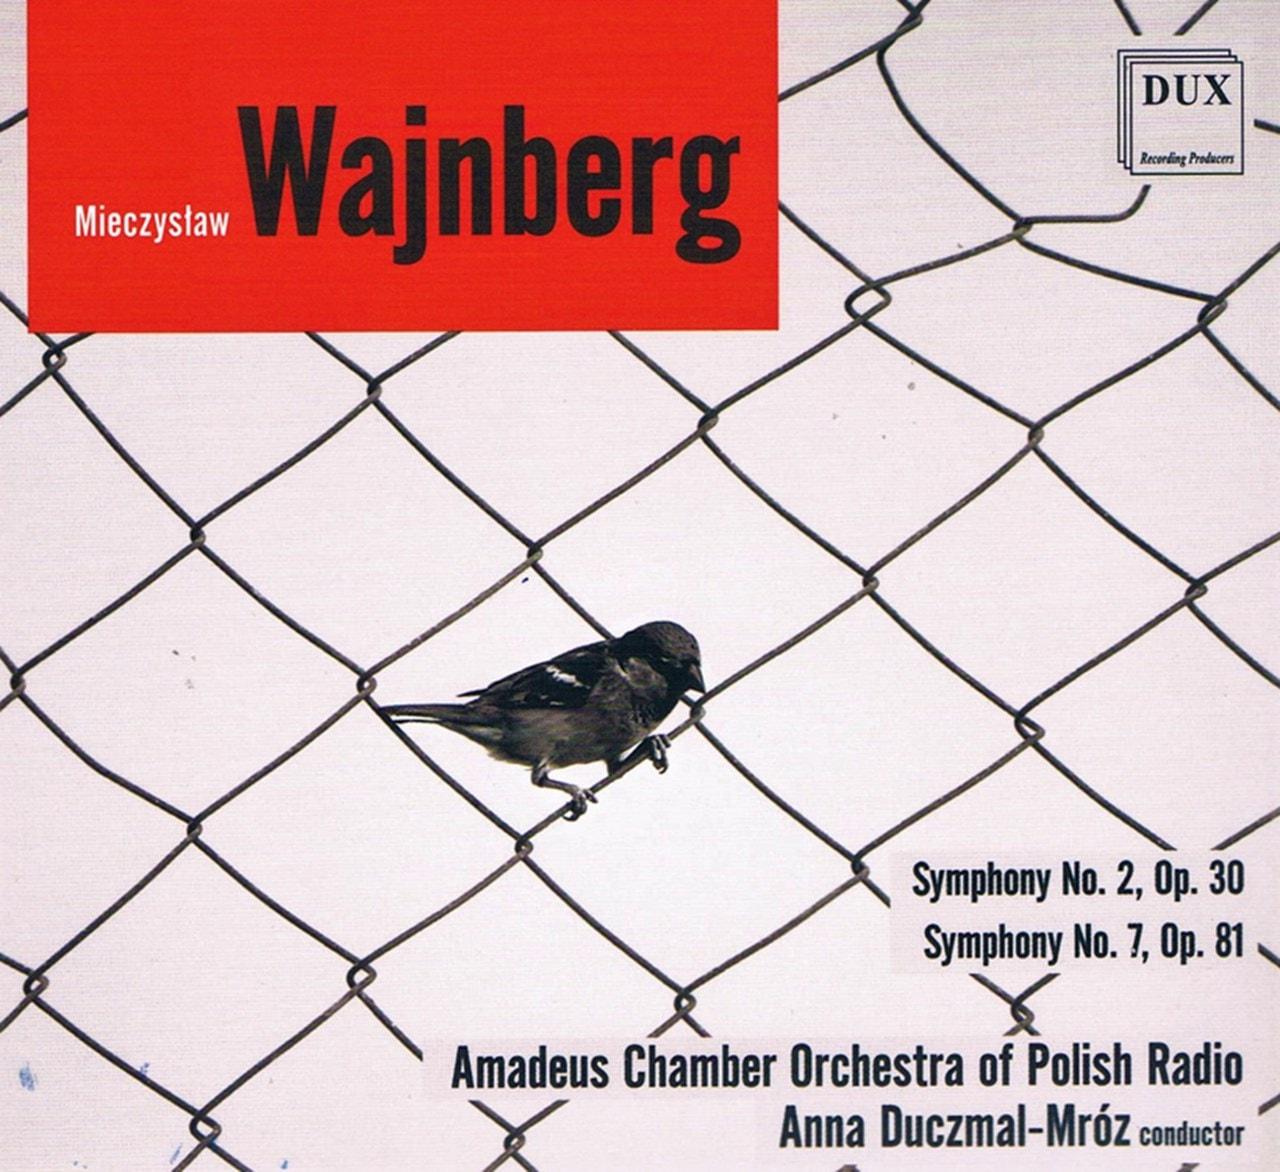 Mieczyslaw Wajnberg: Symphony No. 2, Op. 30/Symphony No. 7... - 1